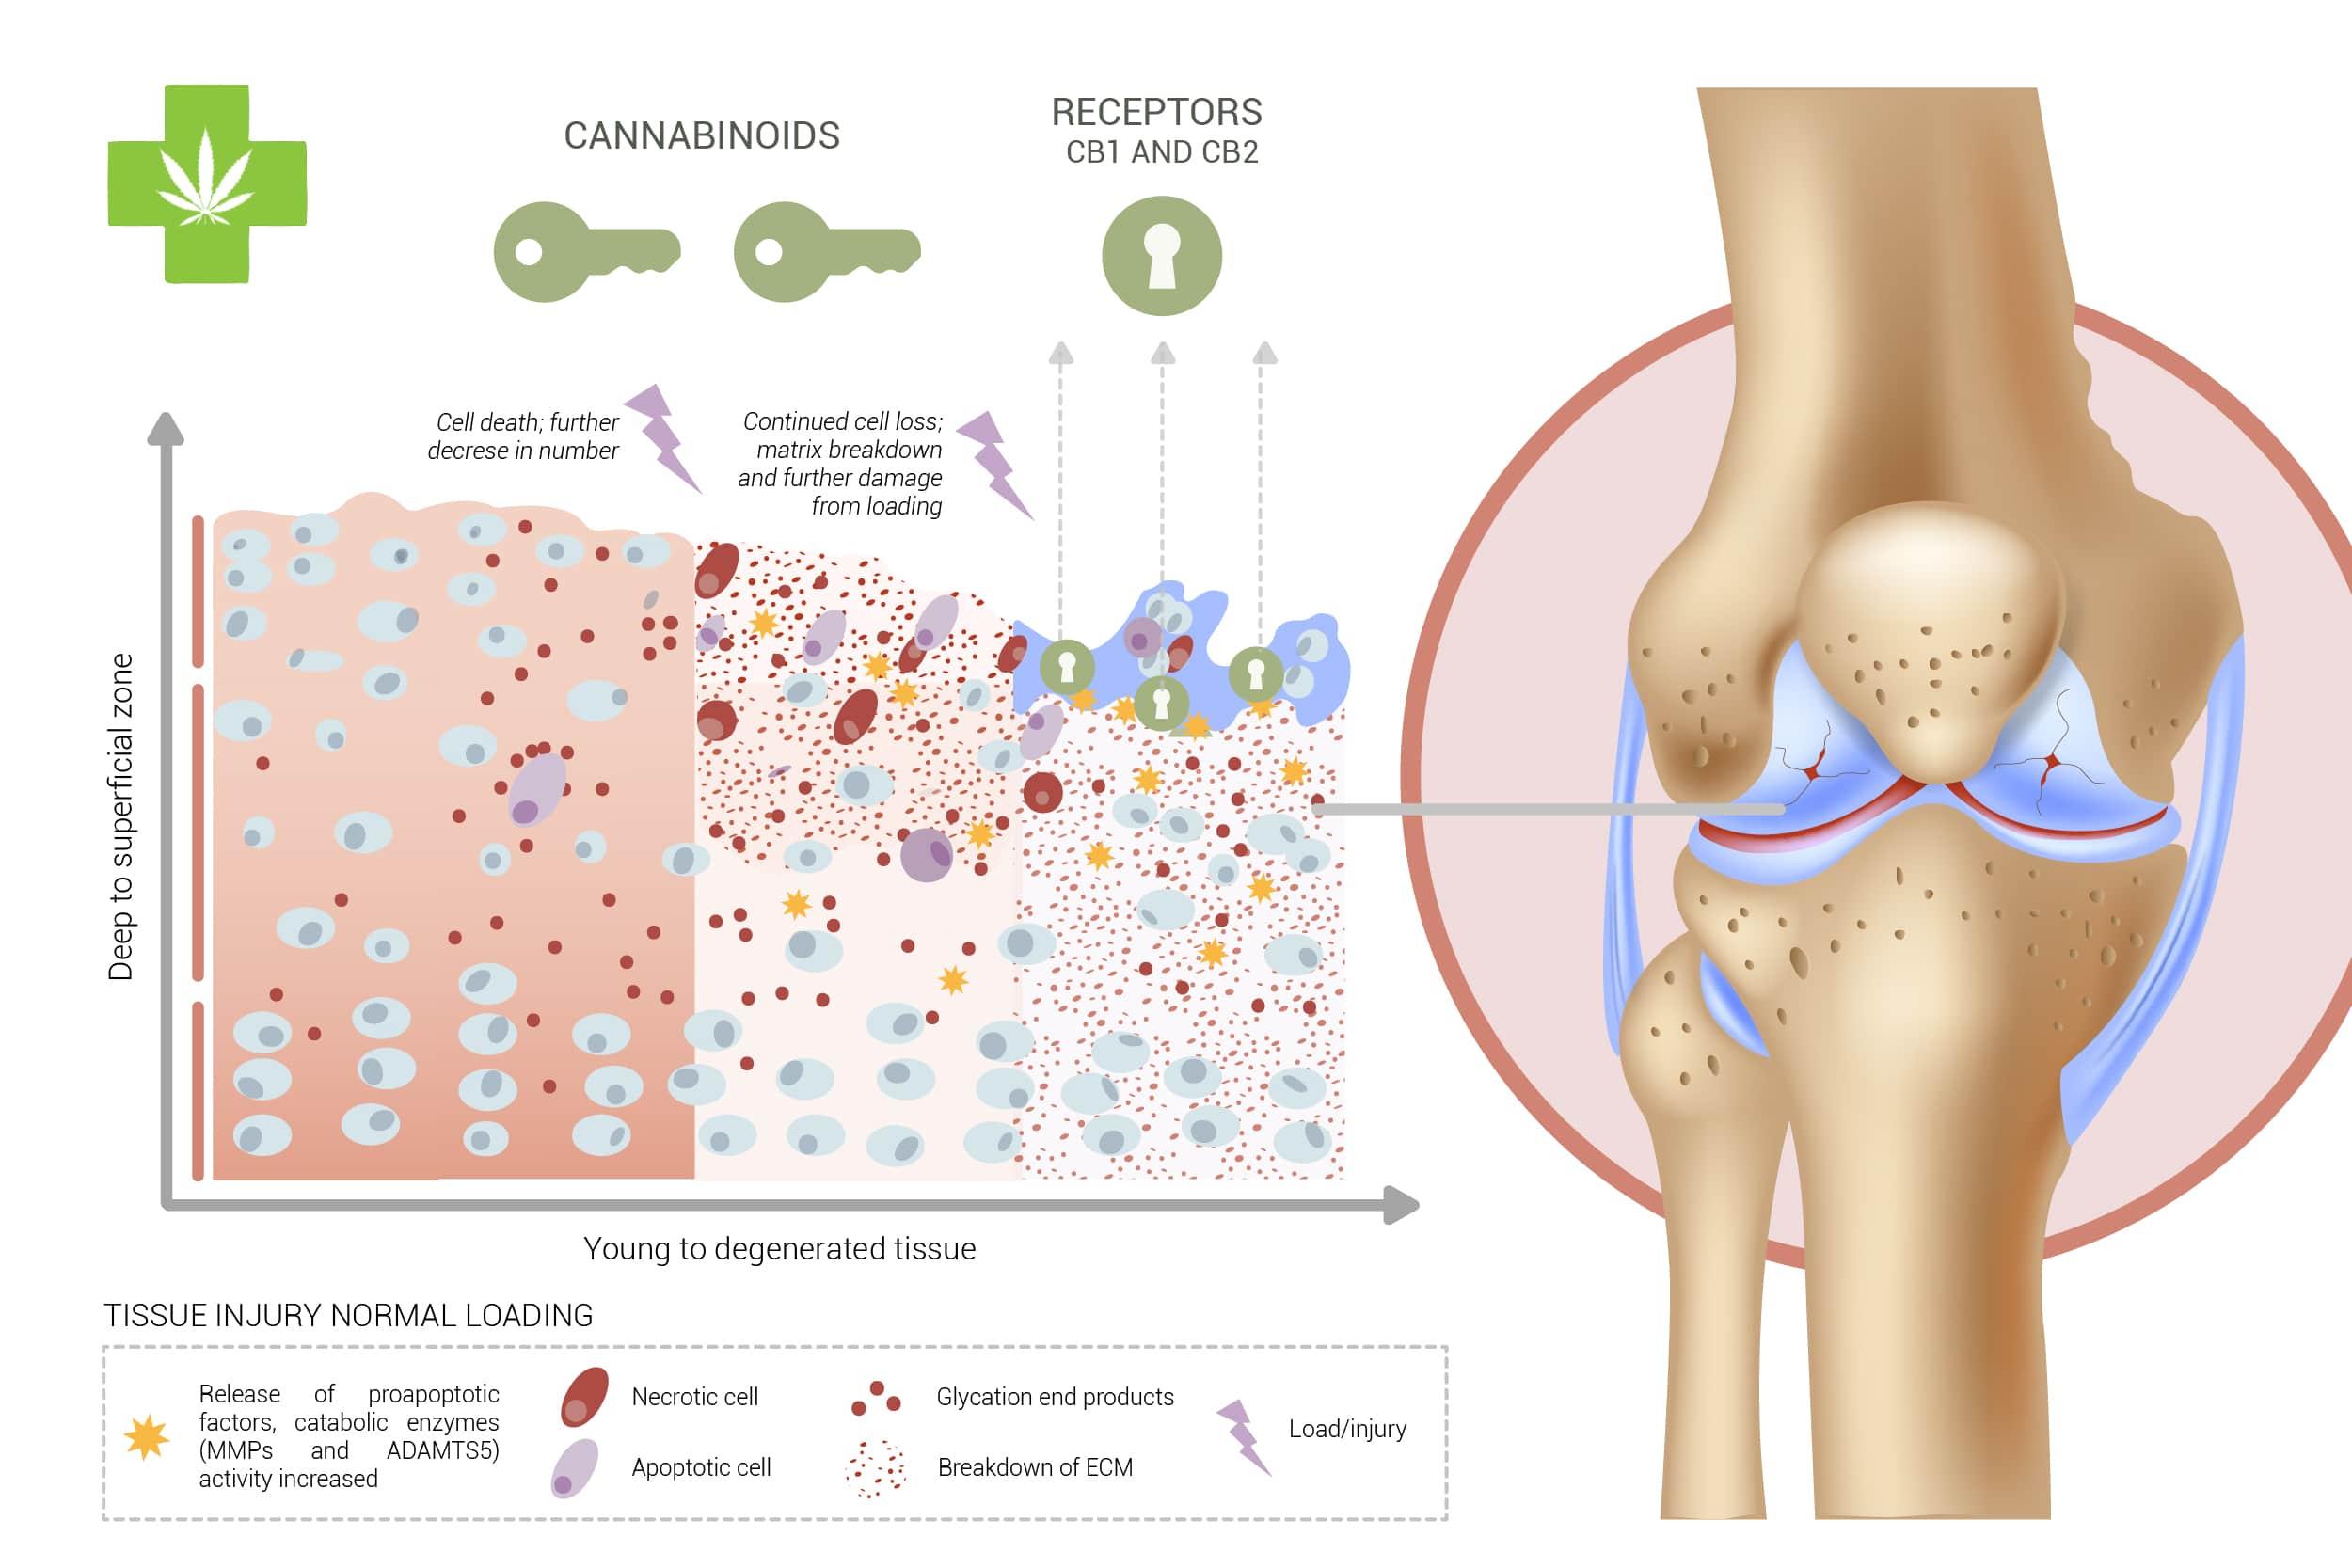 Cannabinoids may help cartilage tissue repairing